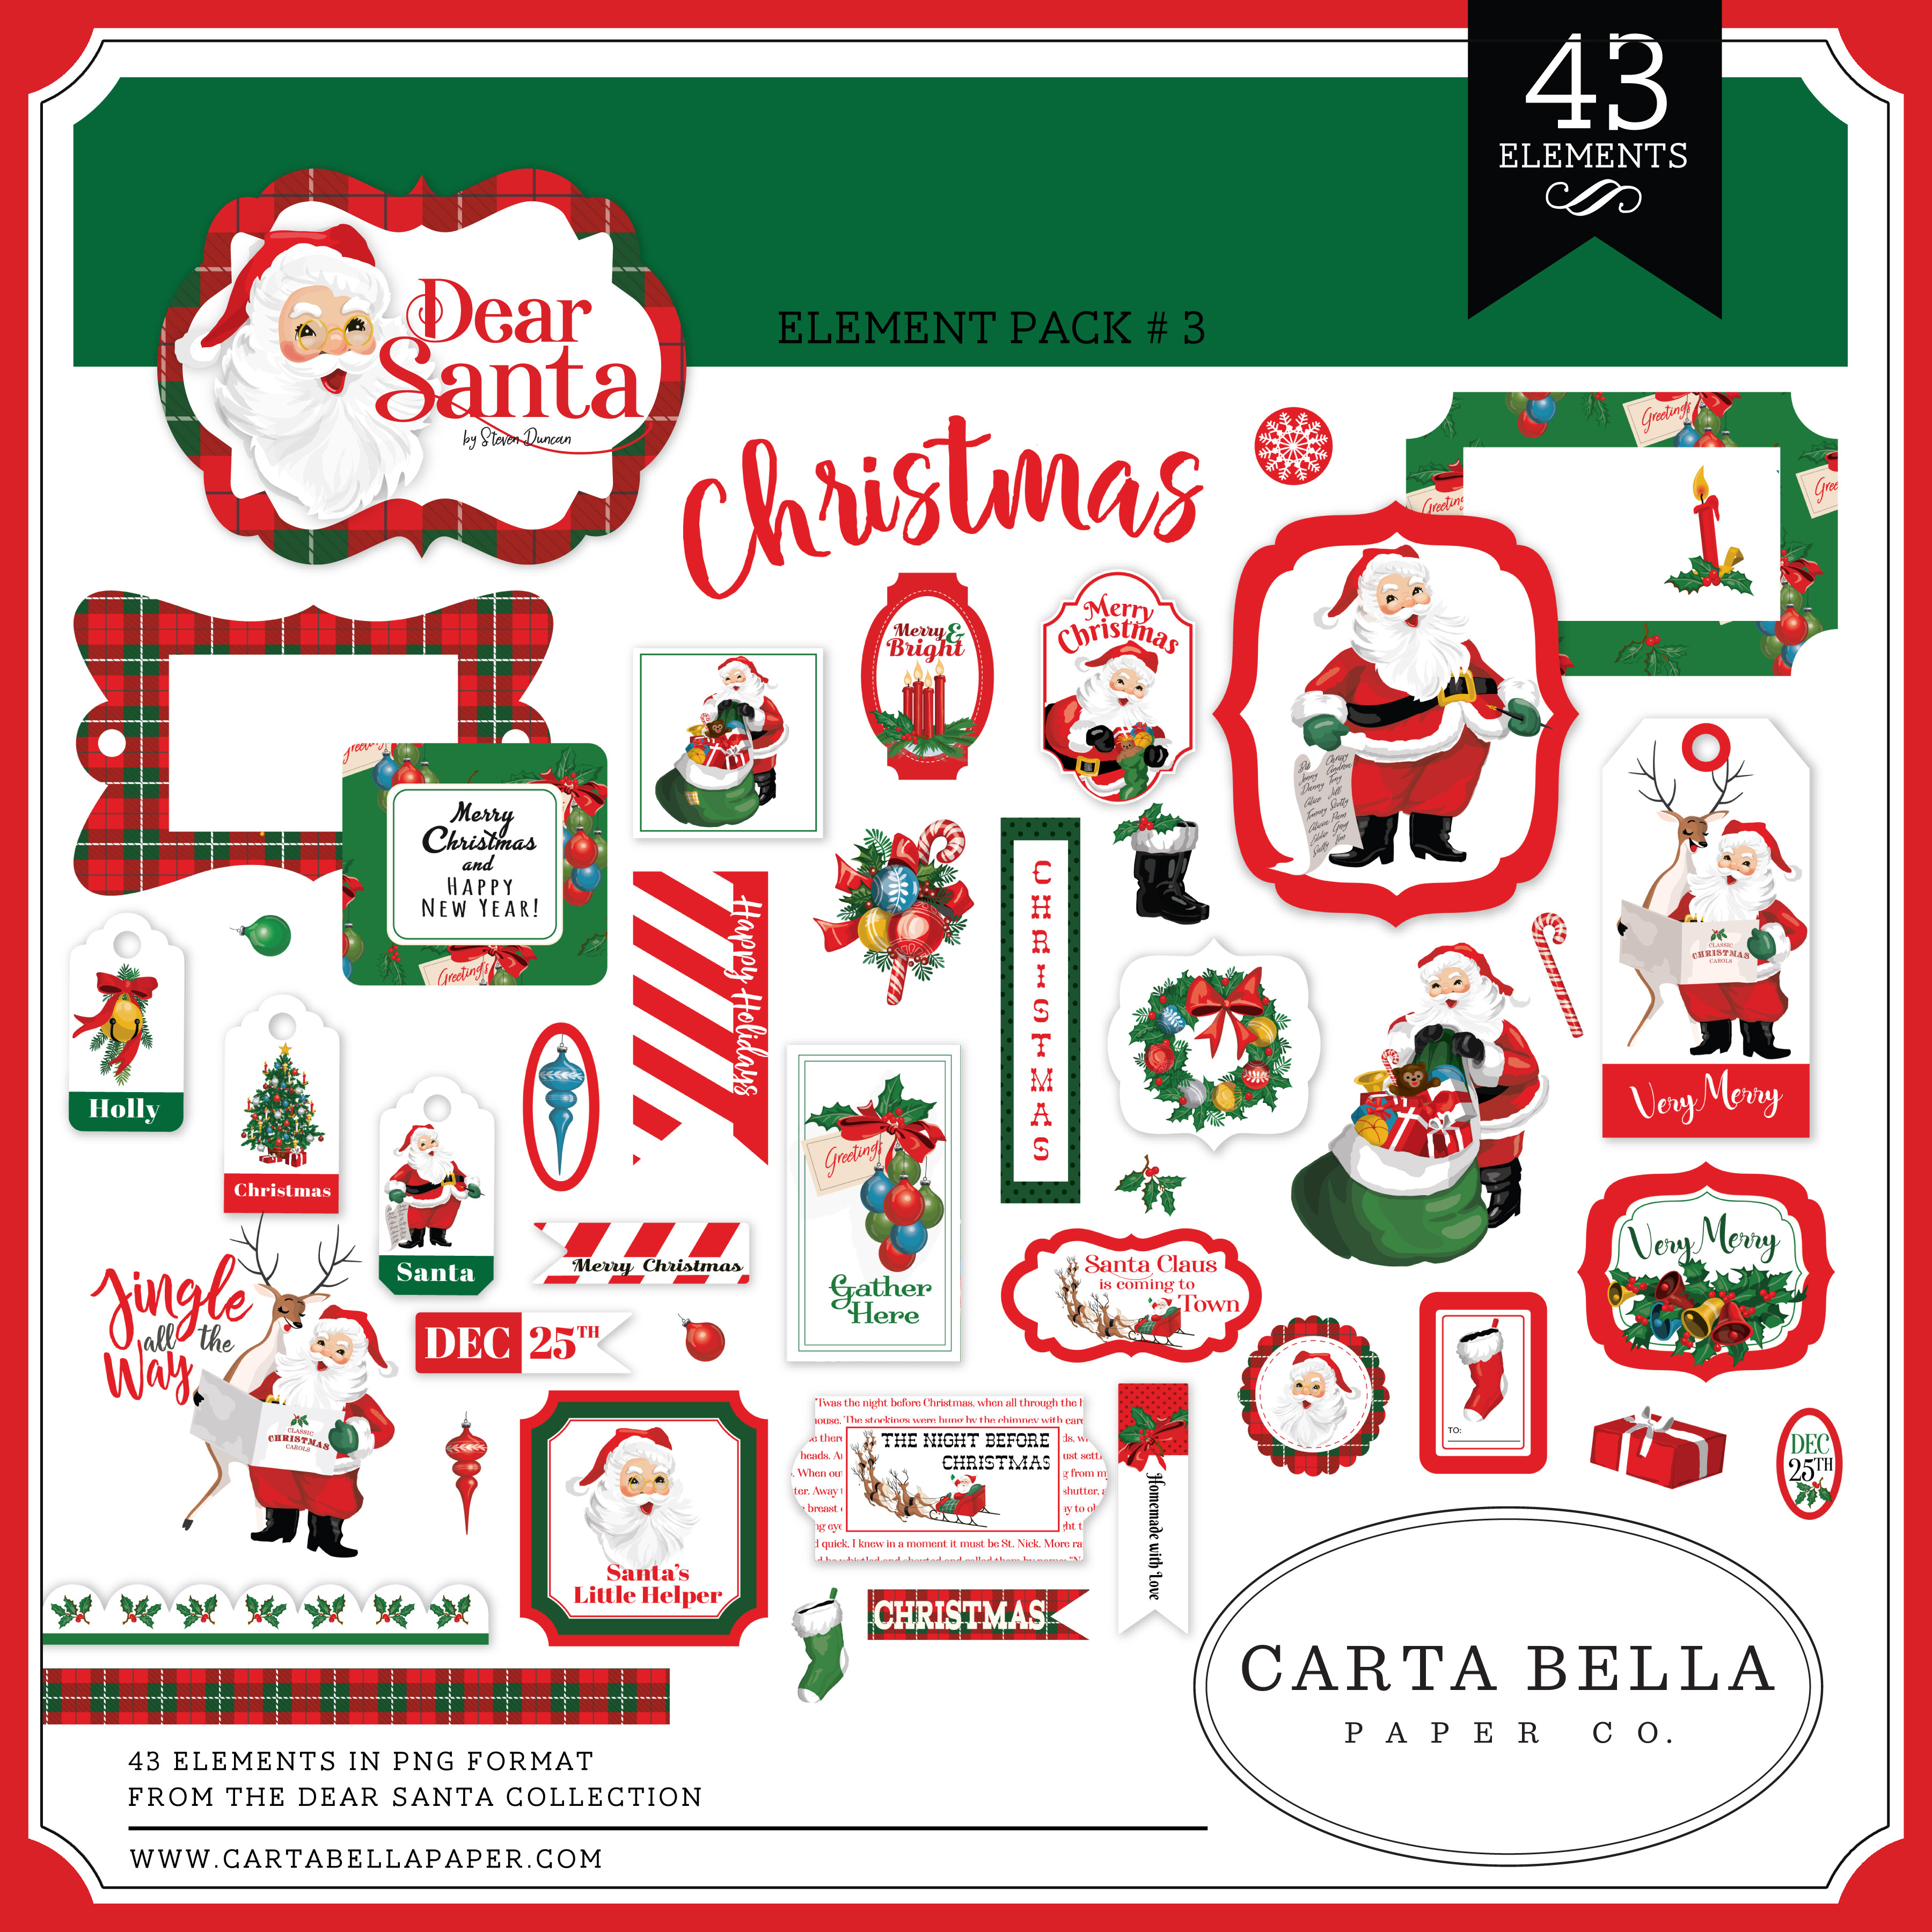 Dear Santa Element Pack #3